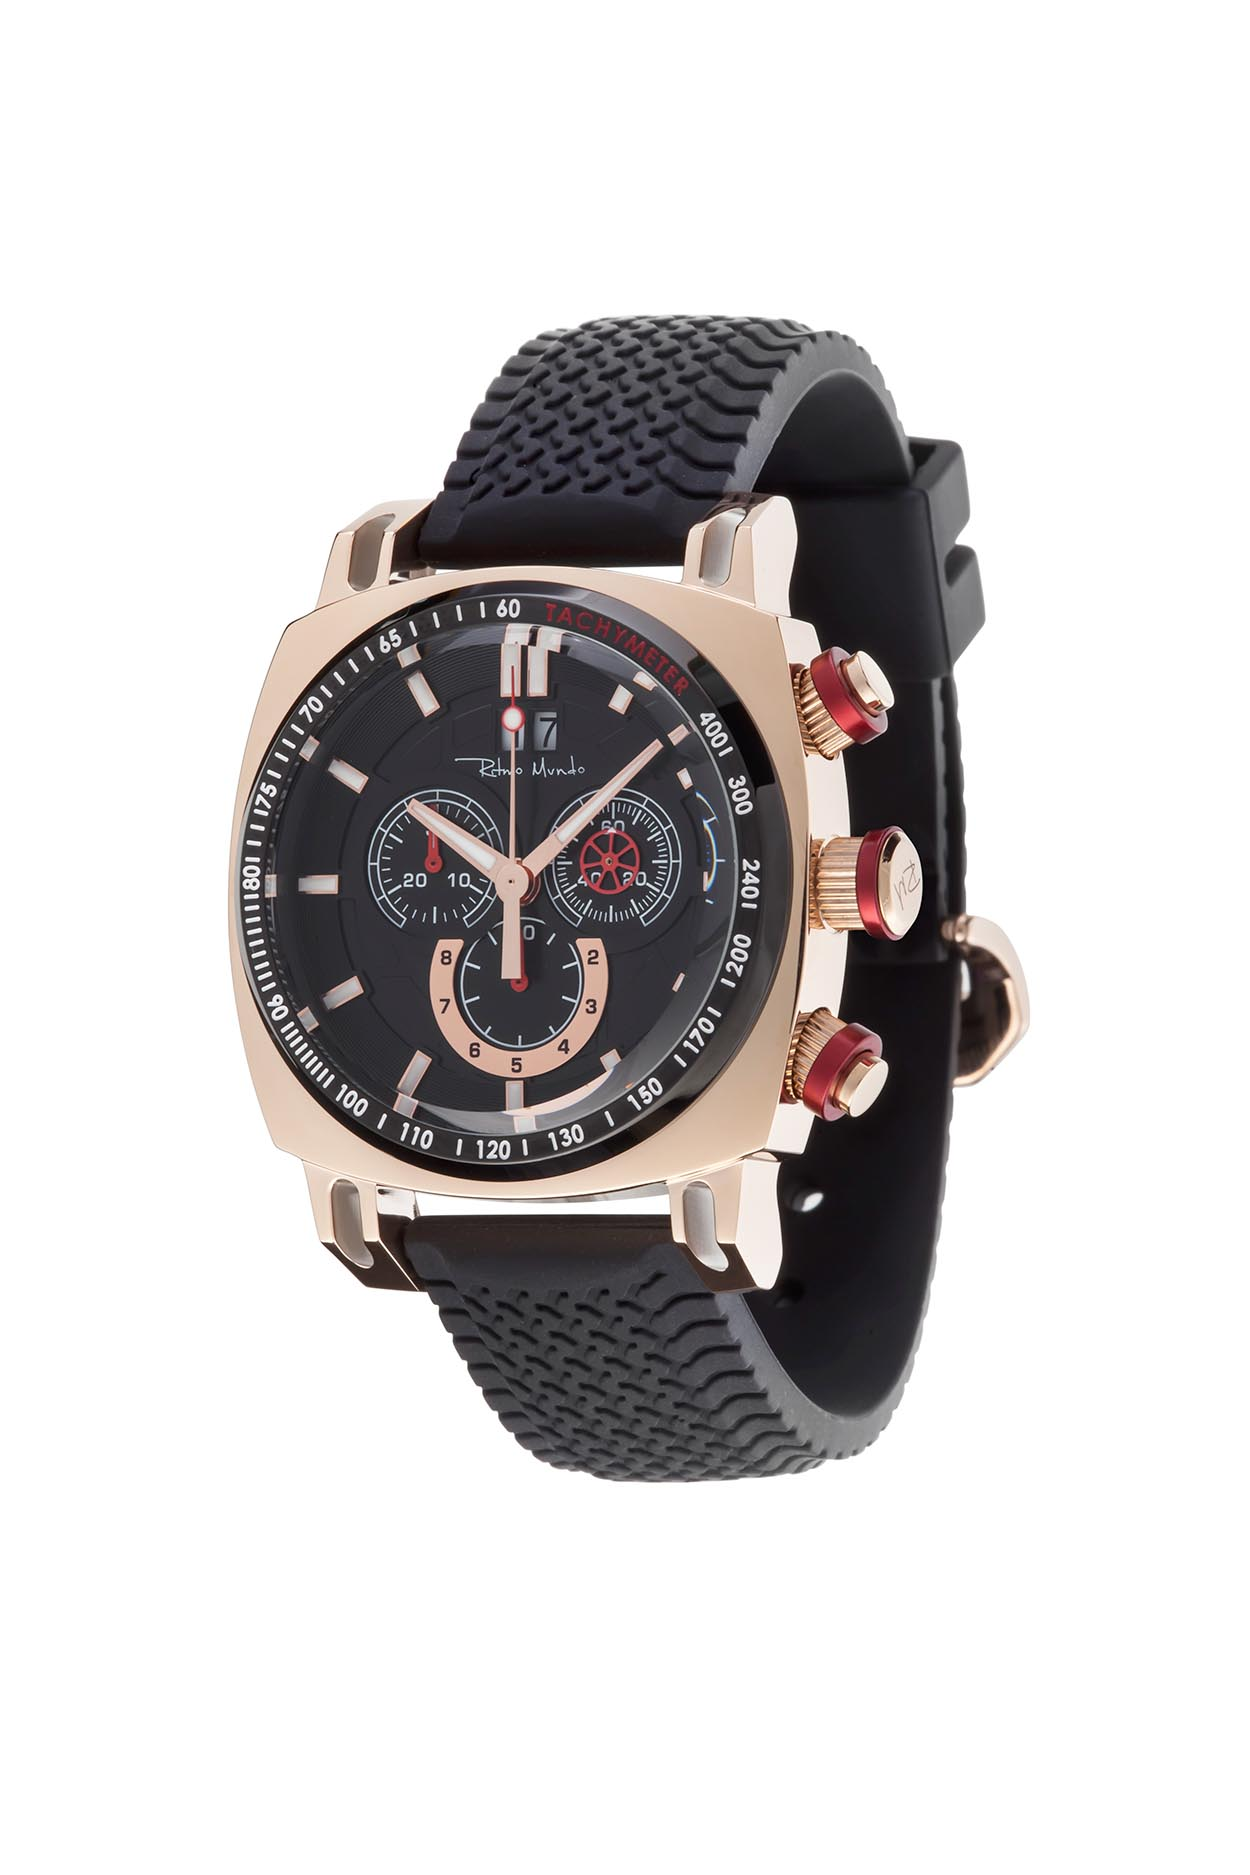 Ritmo Mundo Chronograph Racing watch